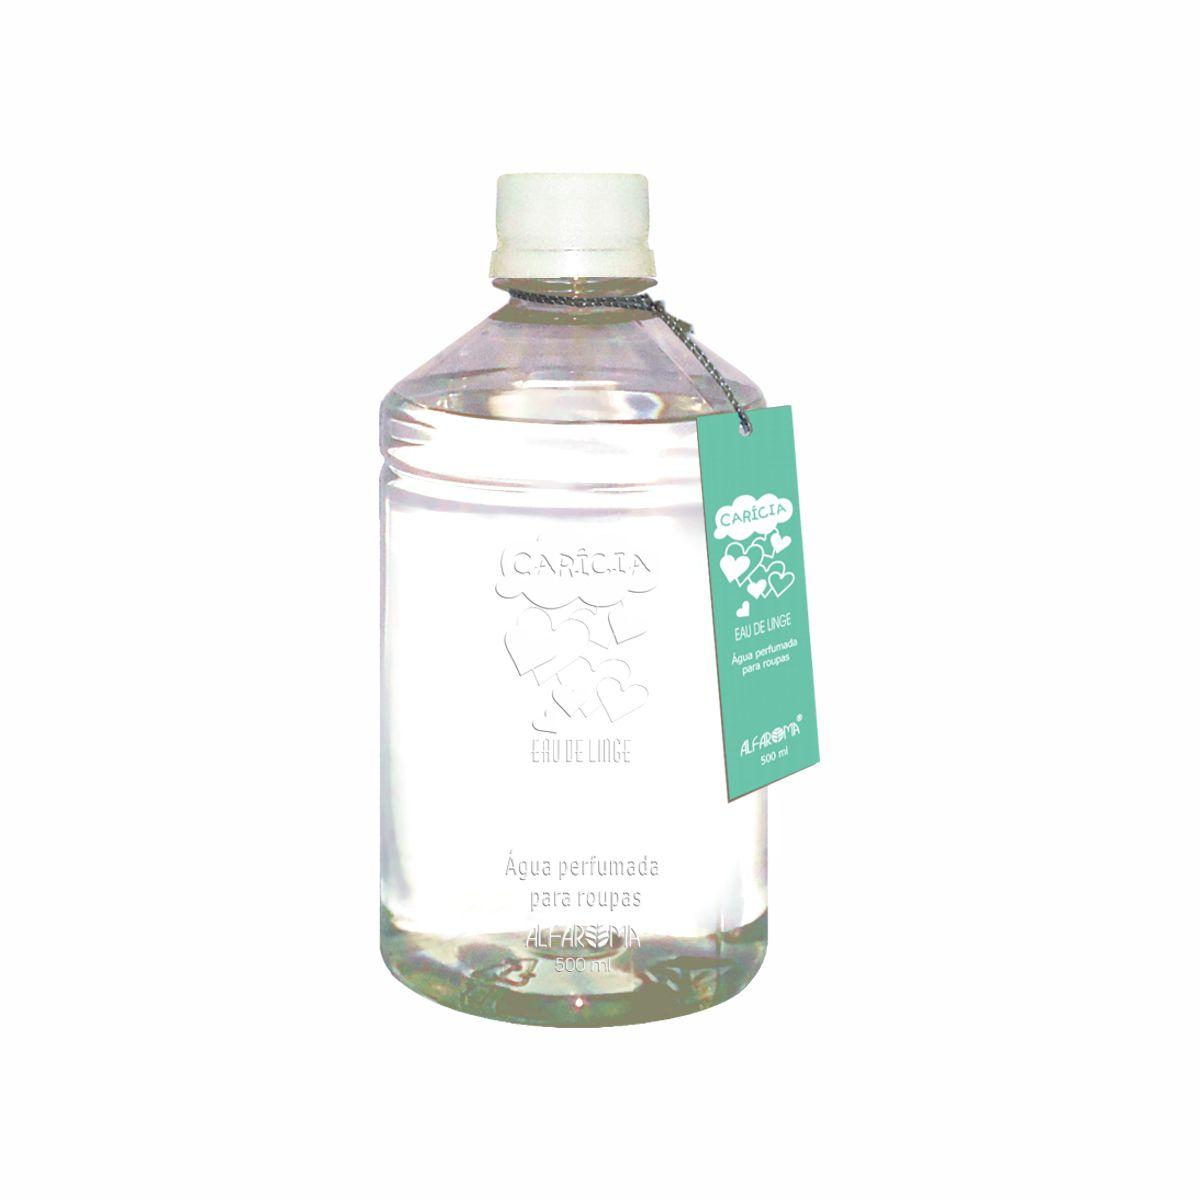 Água Perfumada para Roupas Carícia - Alfaroma